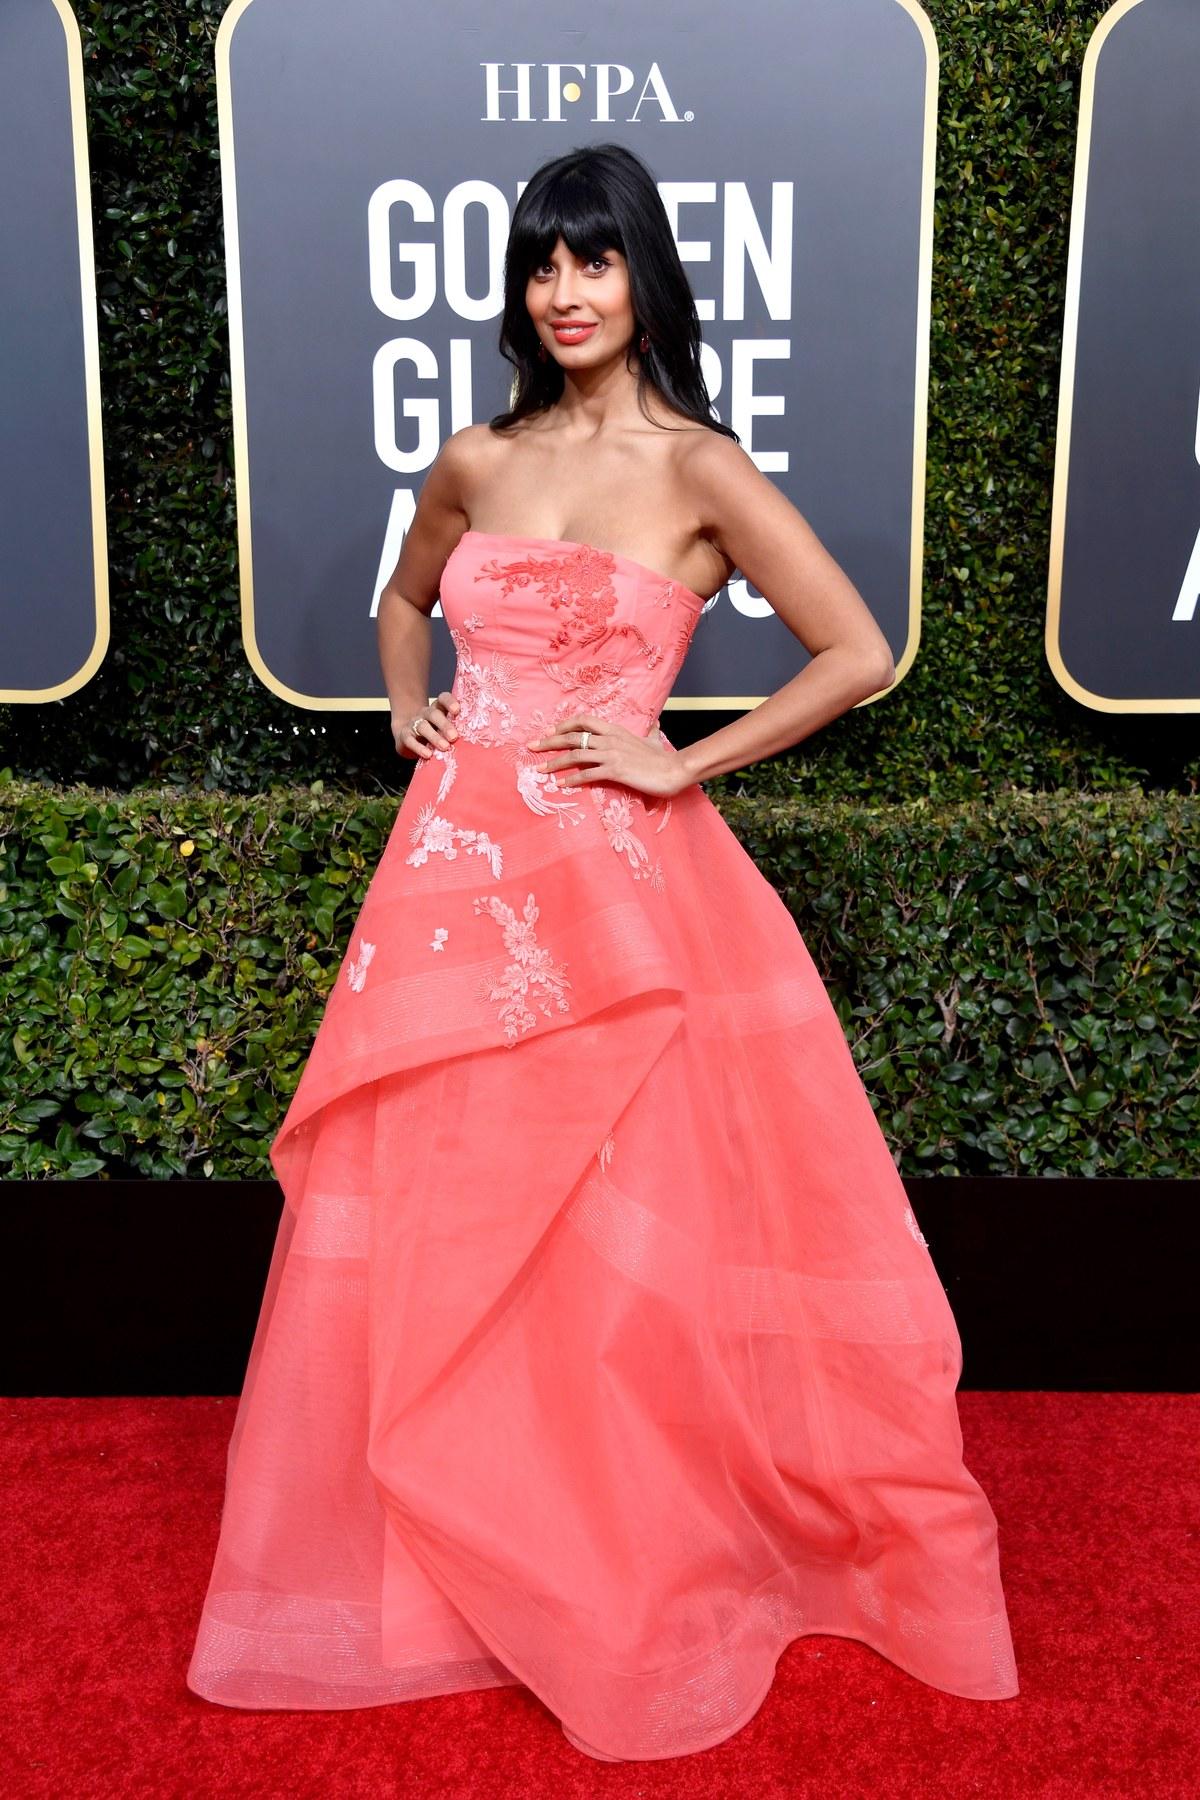 Jameela Jamil wearing Monique Lhuillier Golden Globes